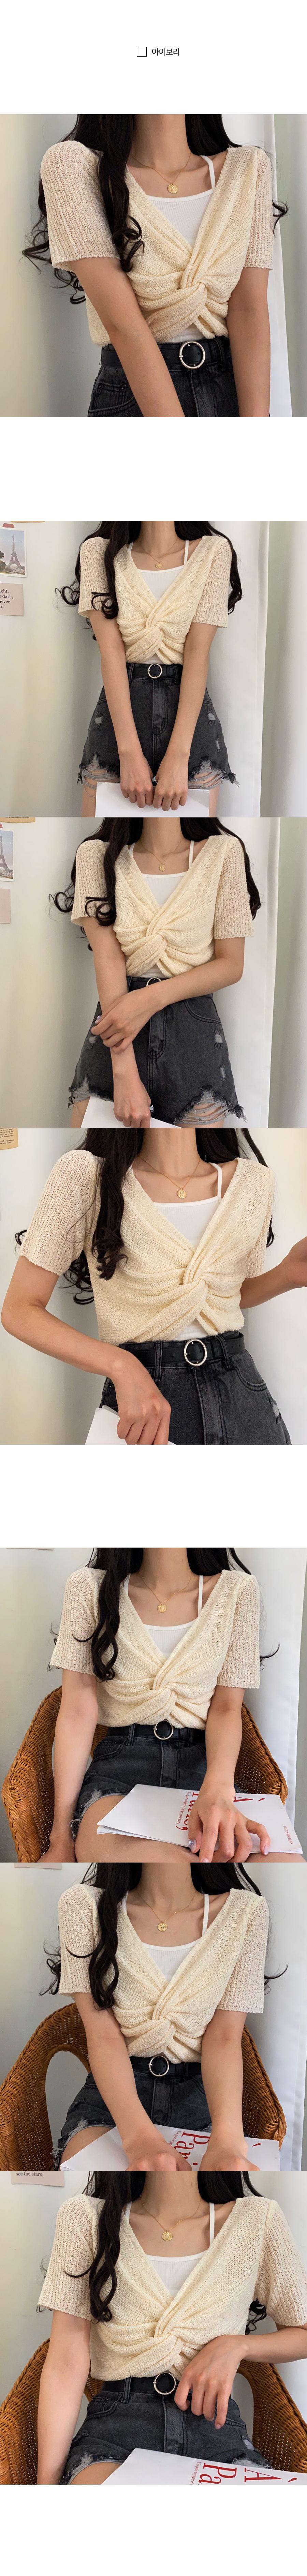 Screw buckle twist knit